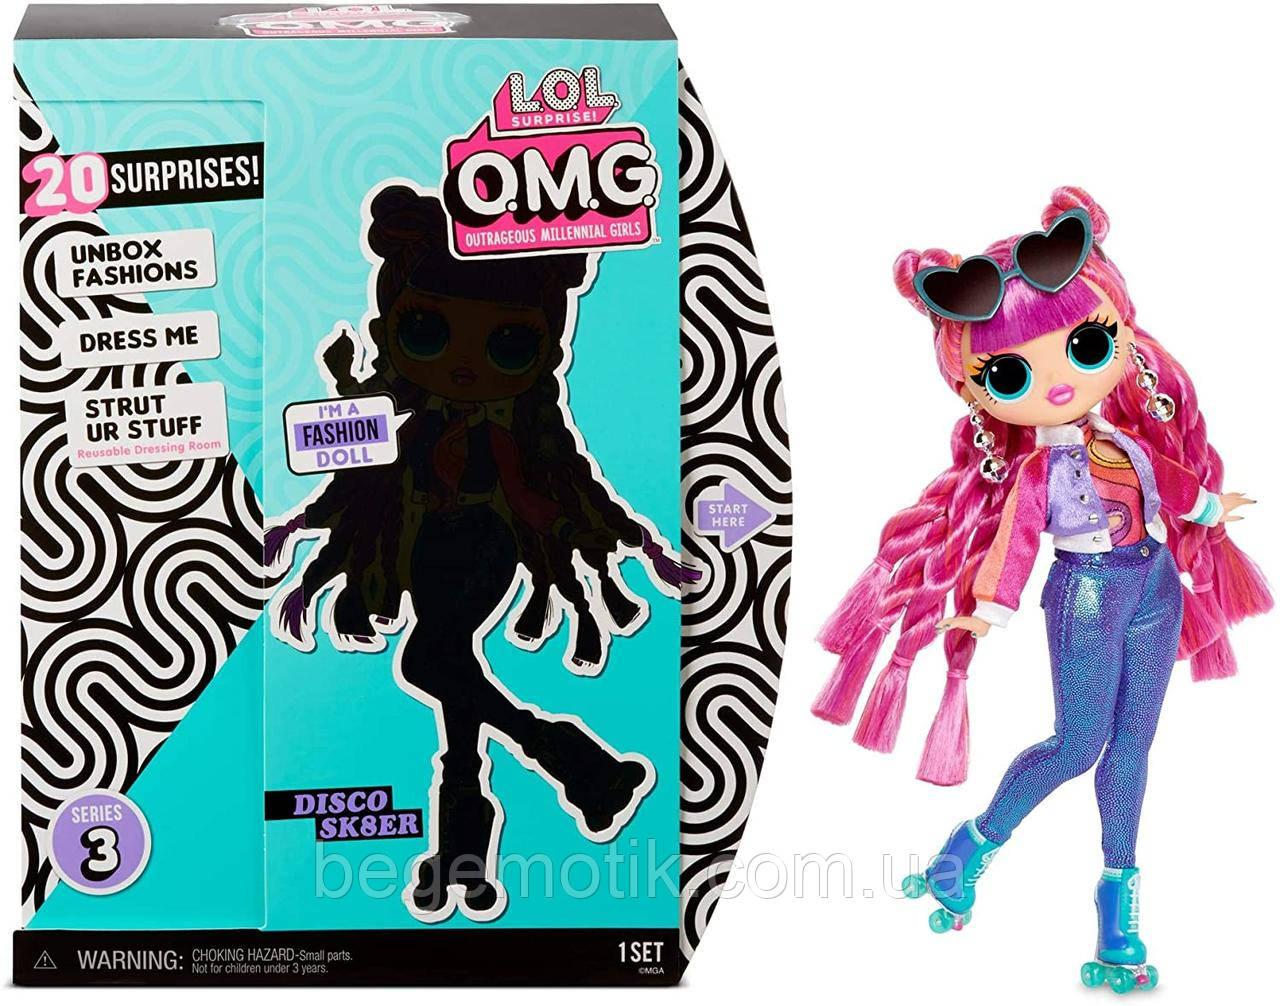 Набор с куклой ЛОЛ ОМГ Диско Скейтер L.O.L. Surprise O.M.G. Series 3 Roller Chick Fashion Do